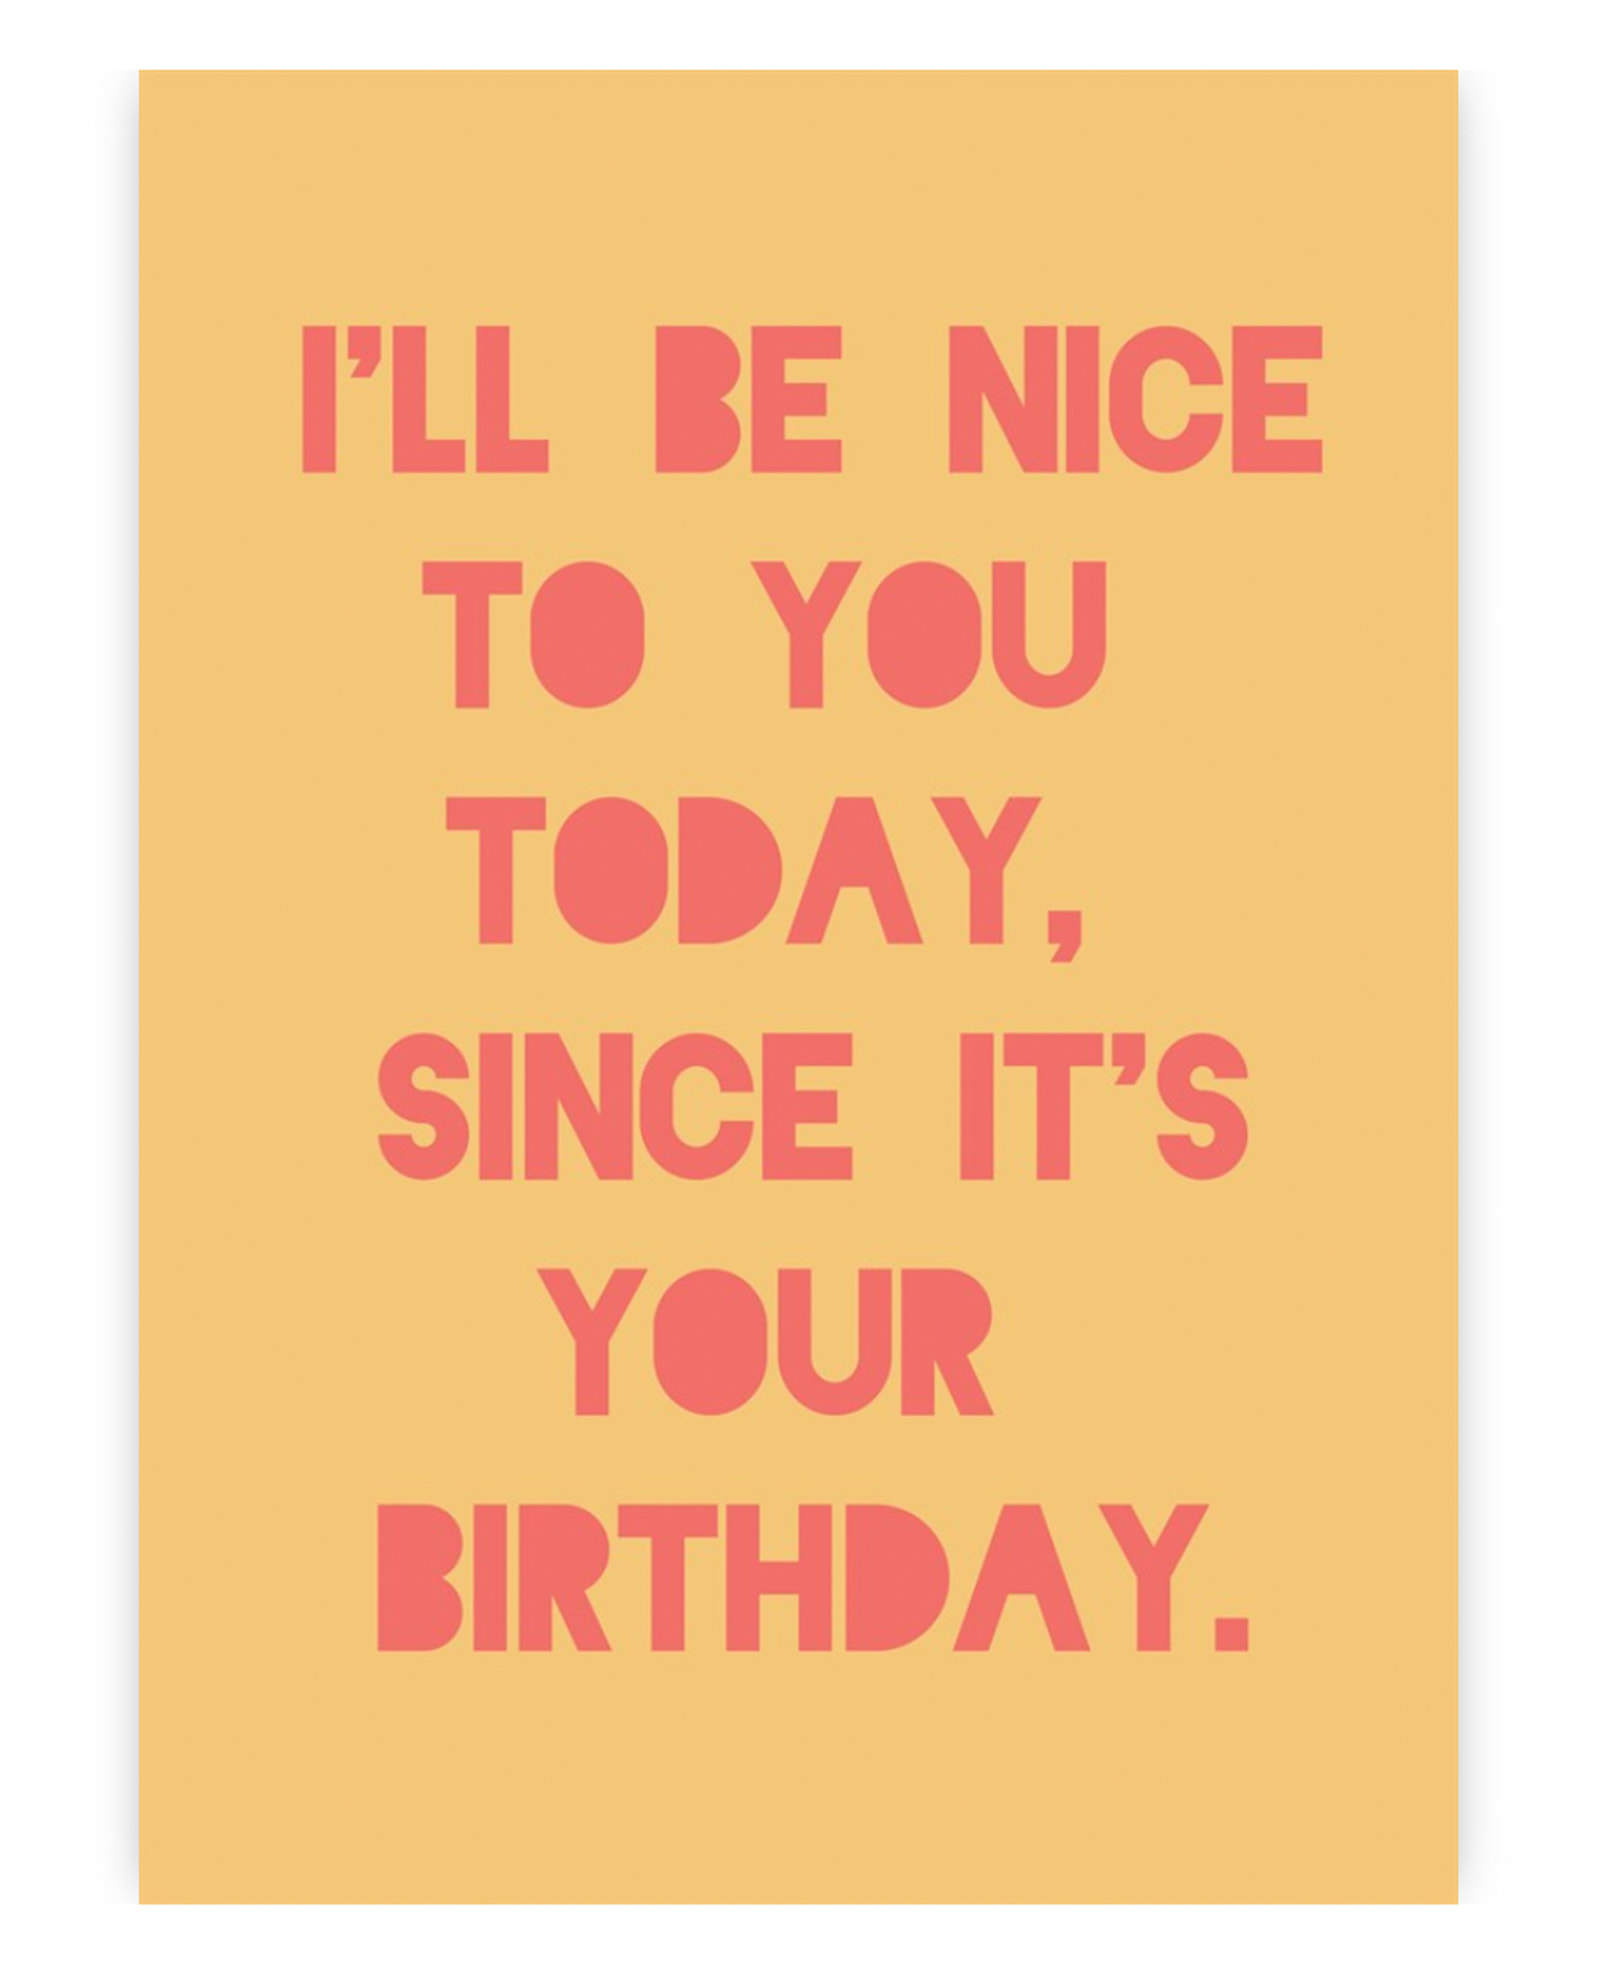 8 funny birthday card ideas